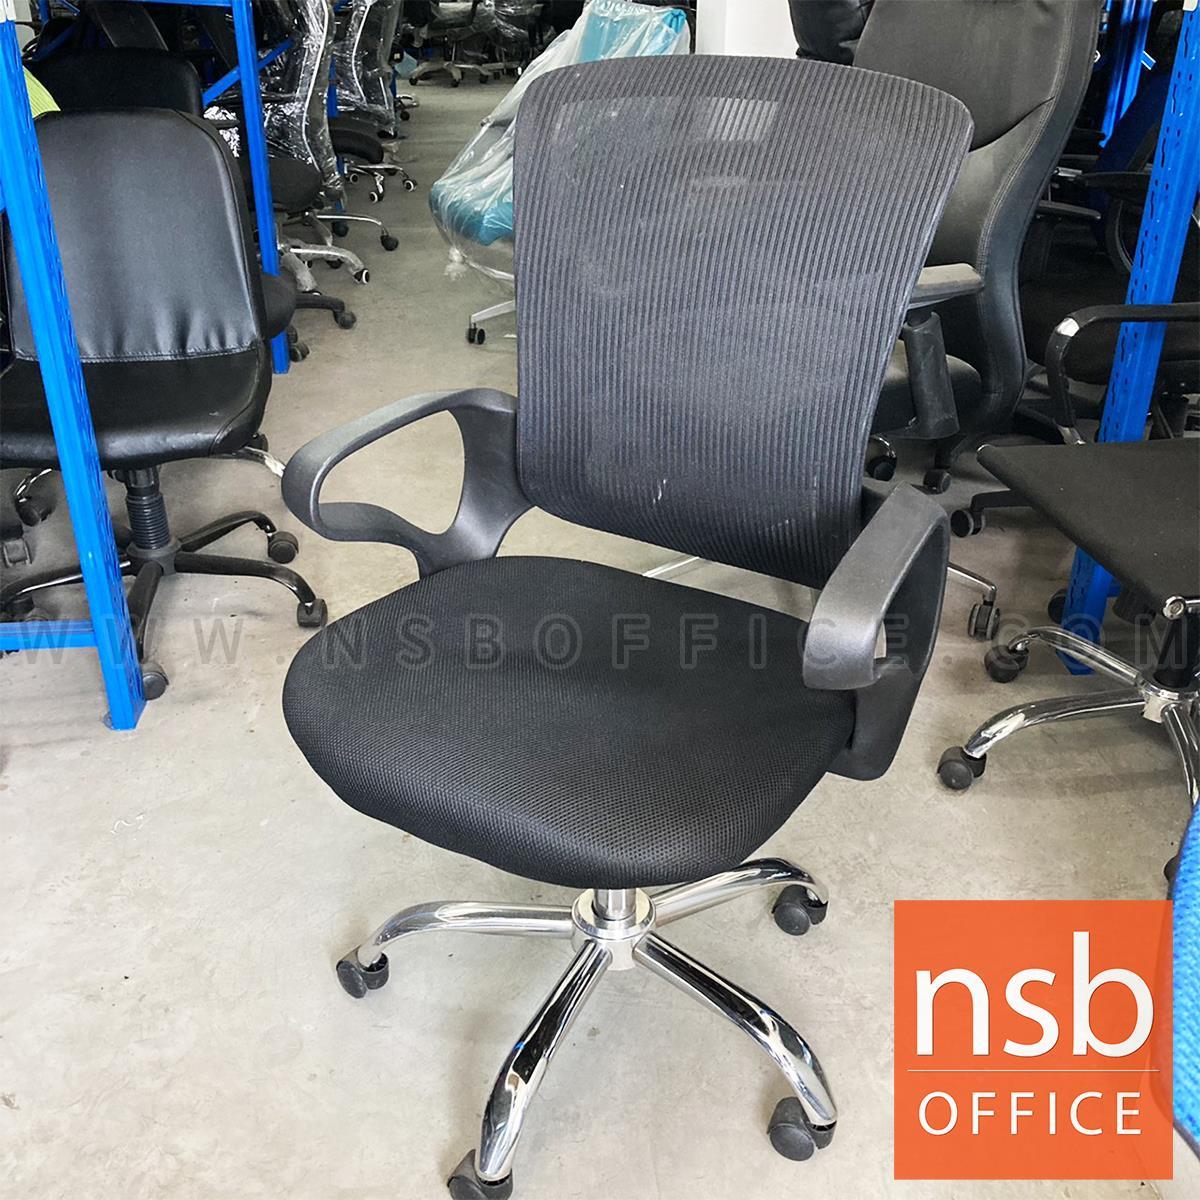 L02A353:เก้าอี้สำนักงานหลังเน็ต   โช๊คแก๊ส มีก้อนโยก ขาเหล็กชุบโครเมี่ยม